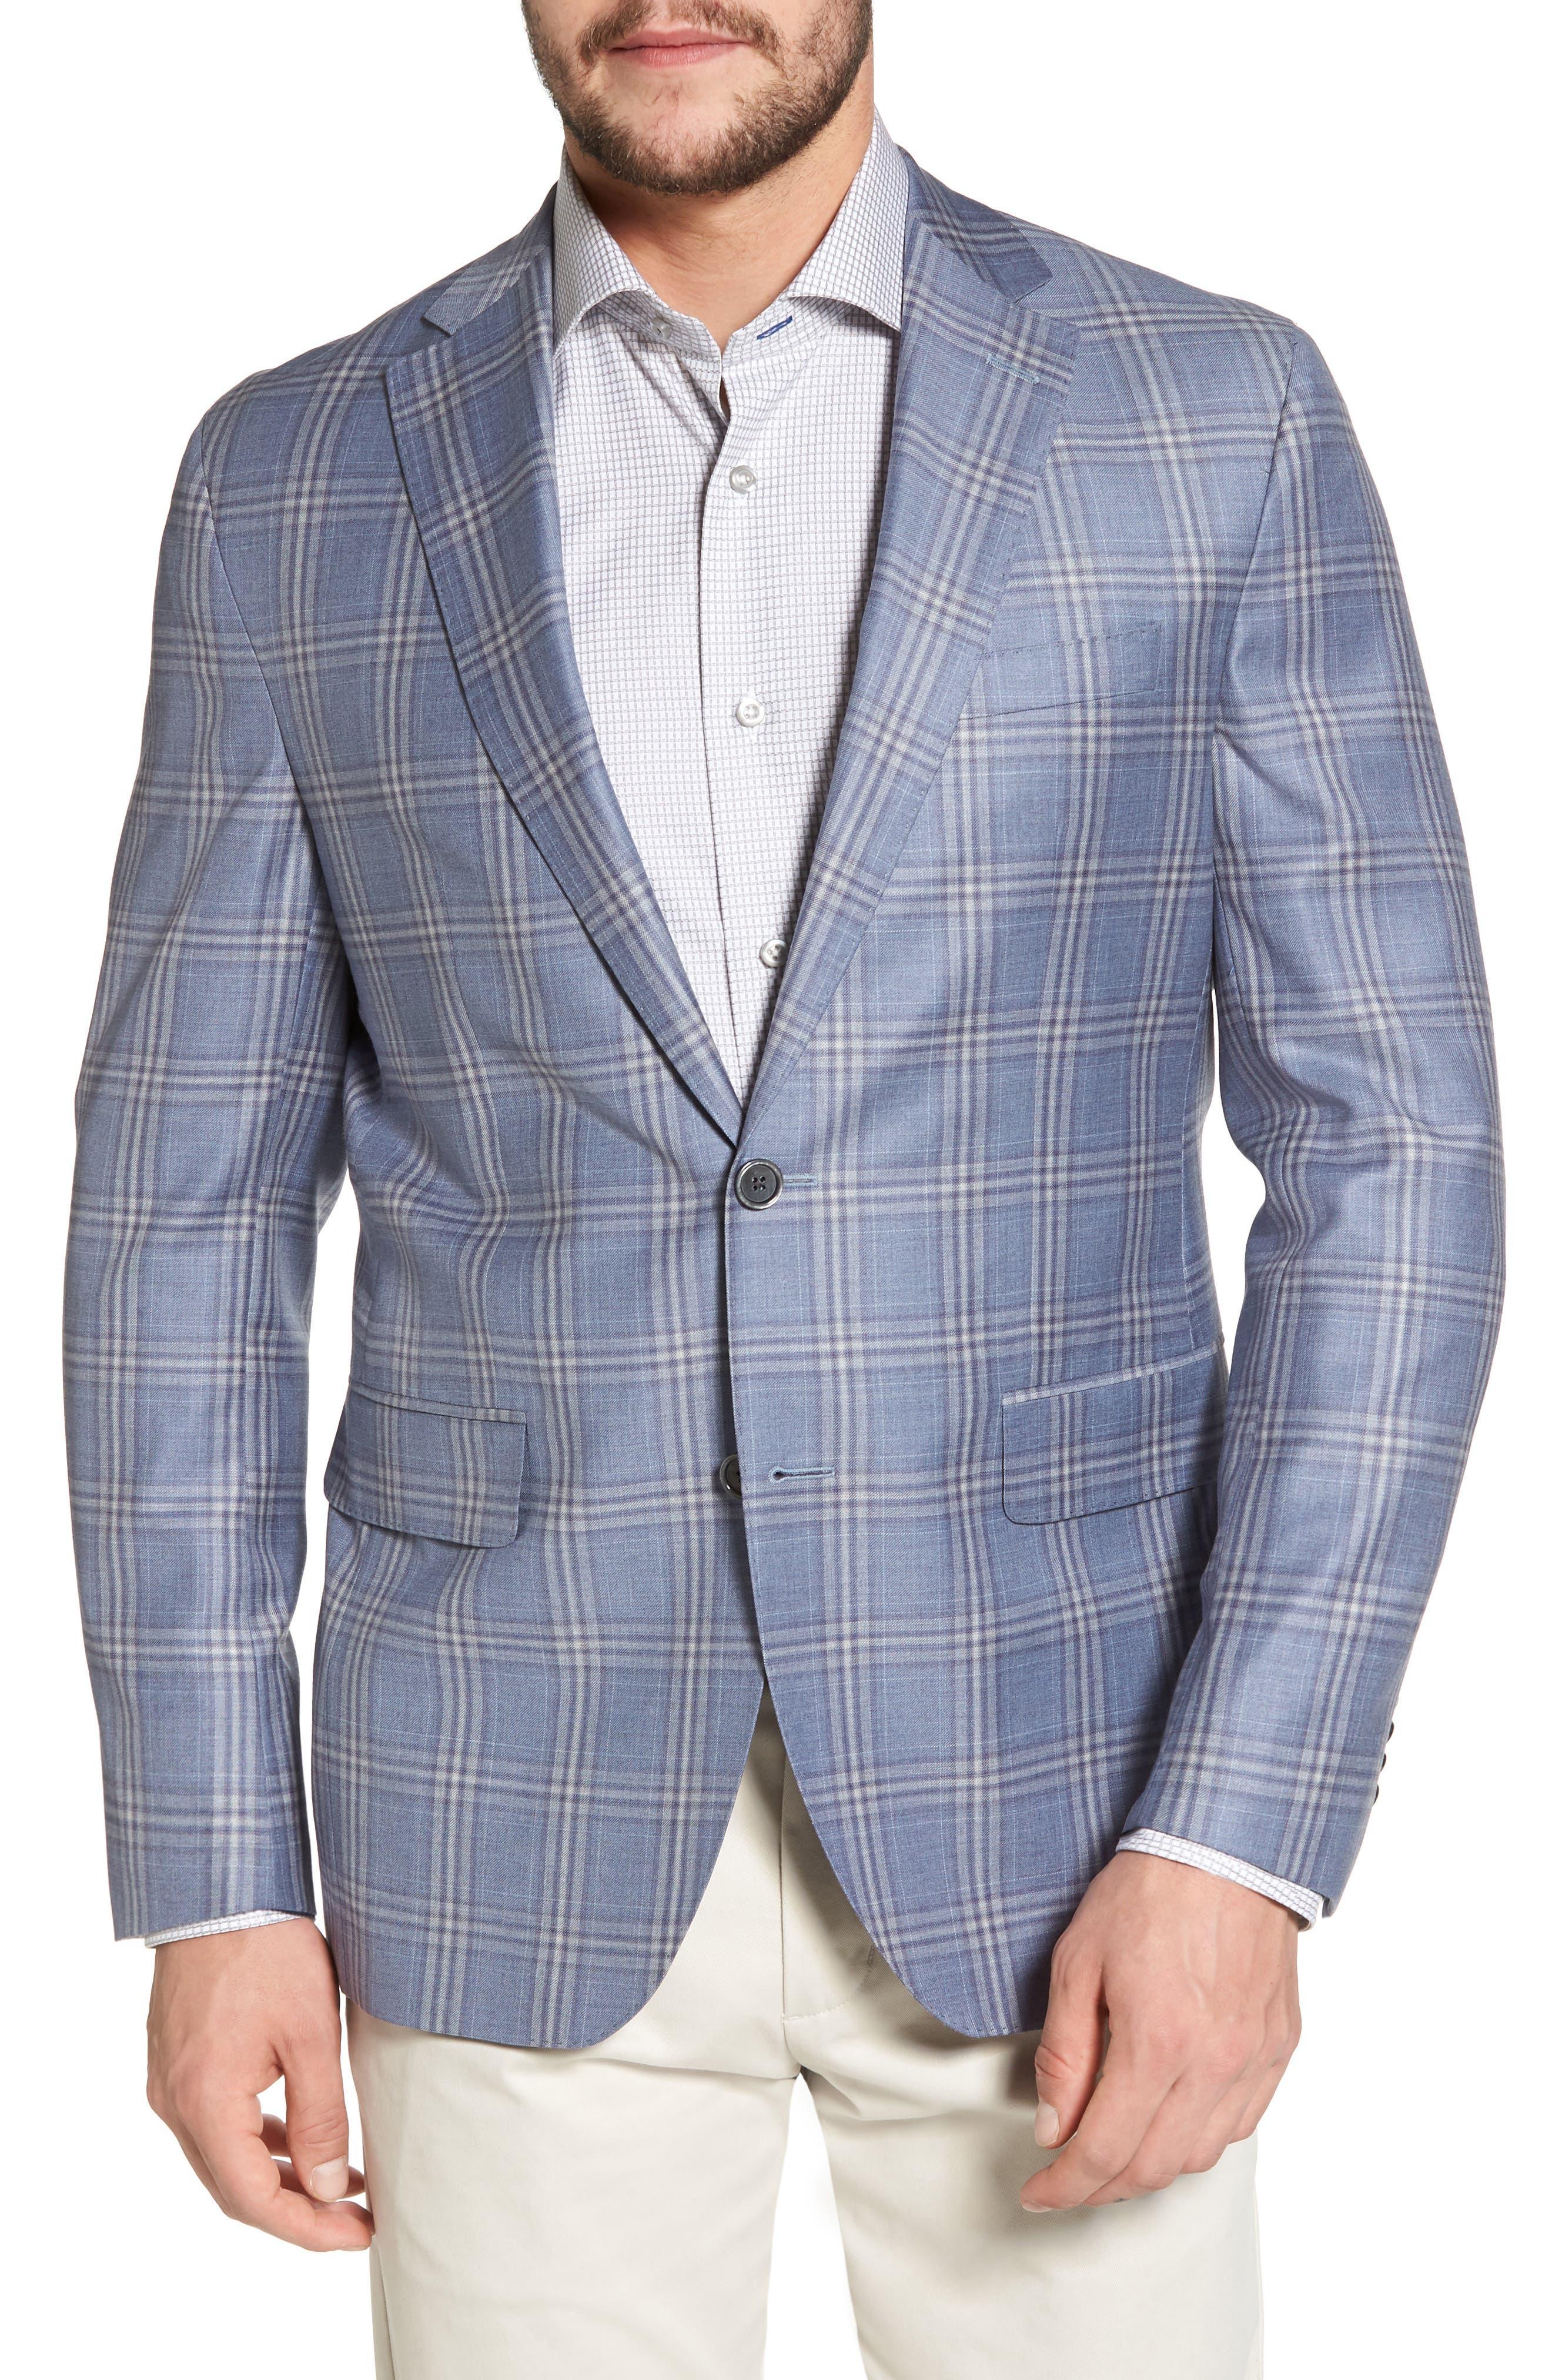 Arnold Classic Fit Plaid Wool Sport Coat,                             Main thumbnail 1, color,                             400